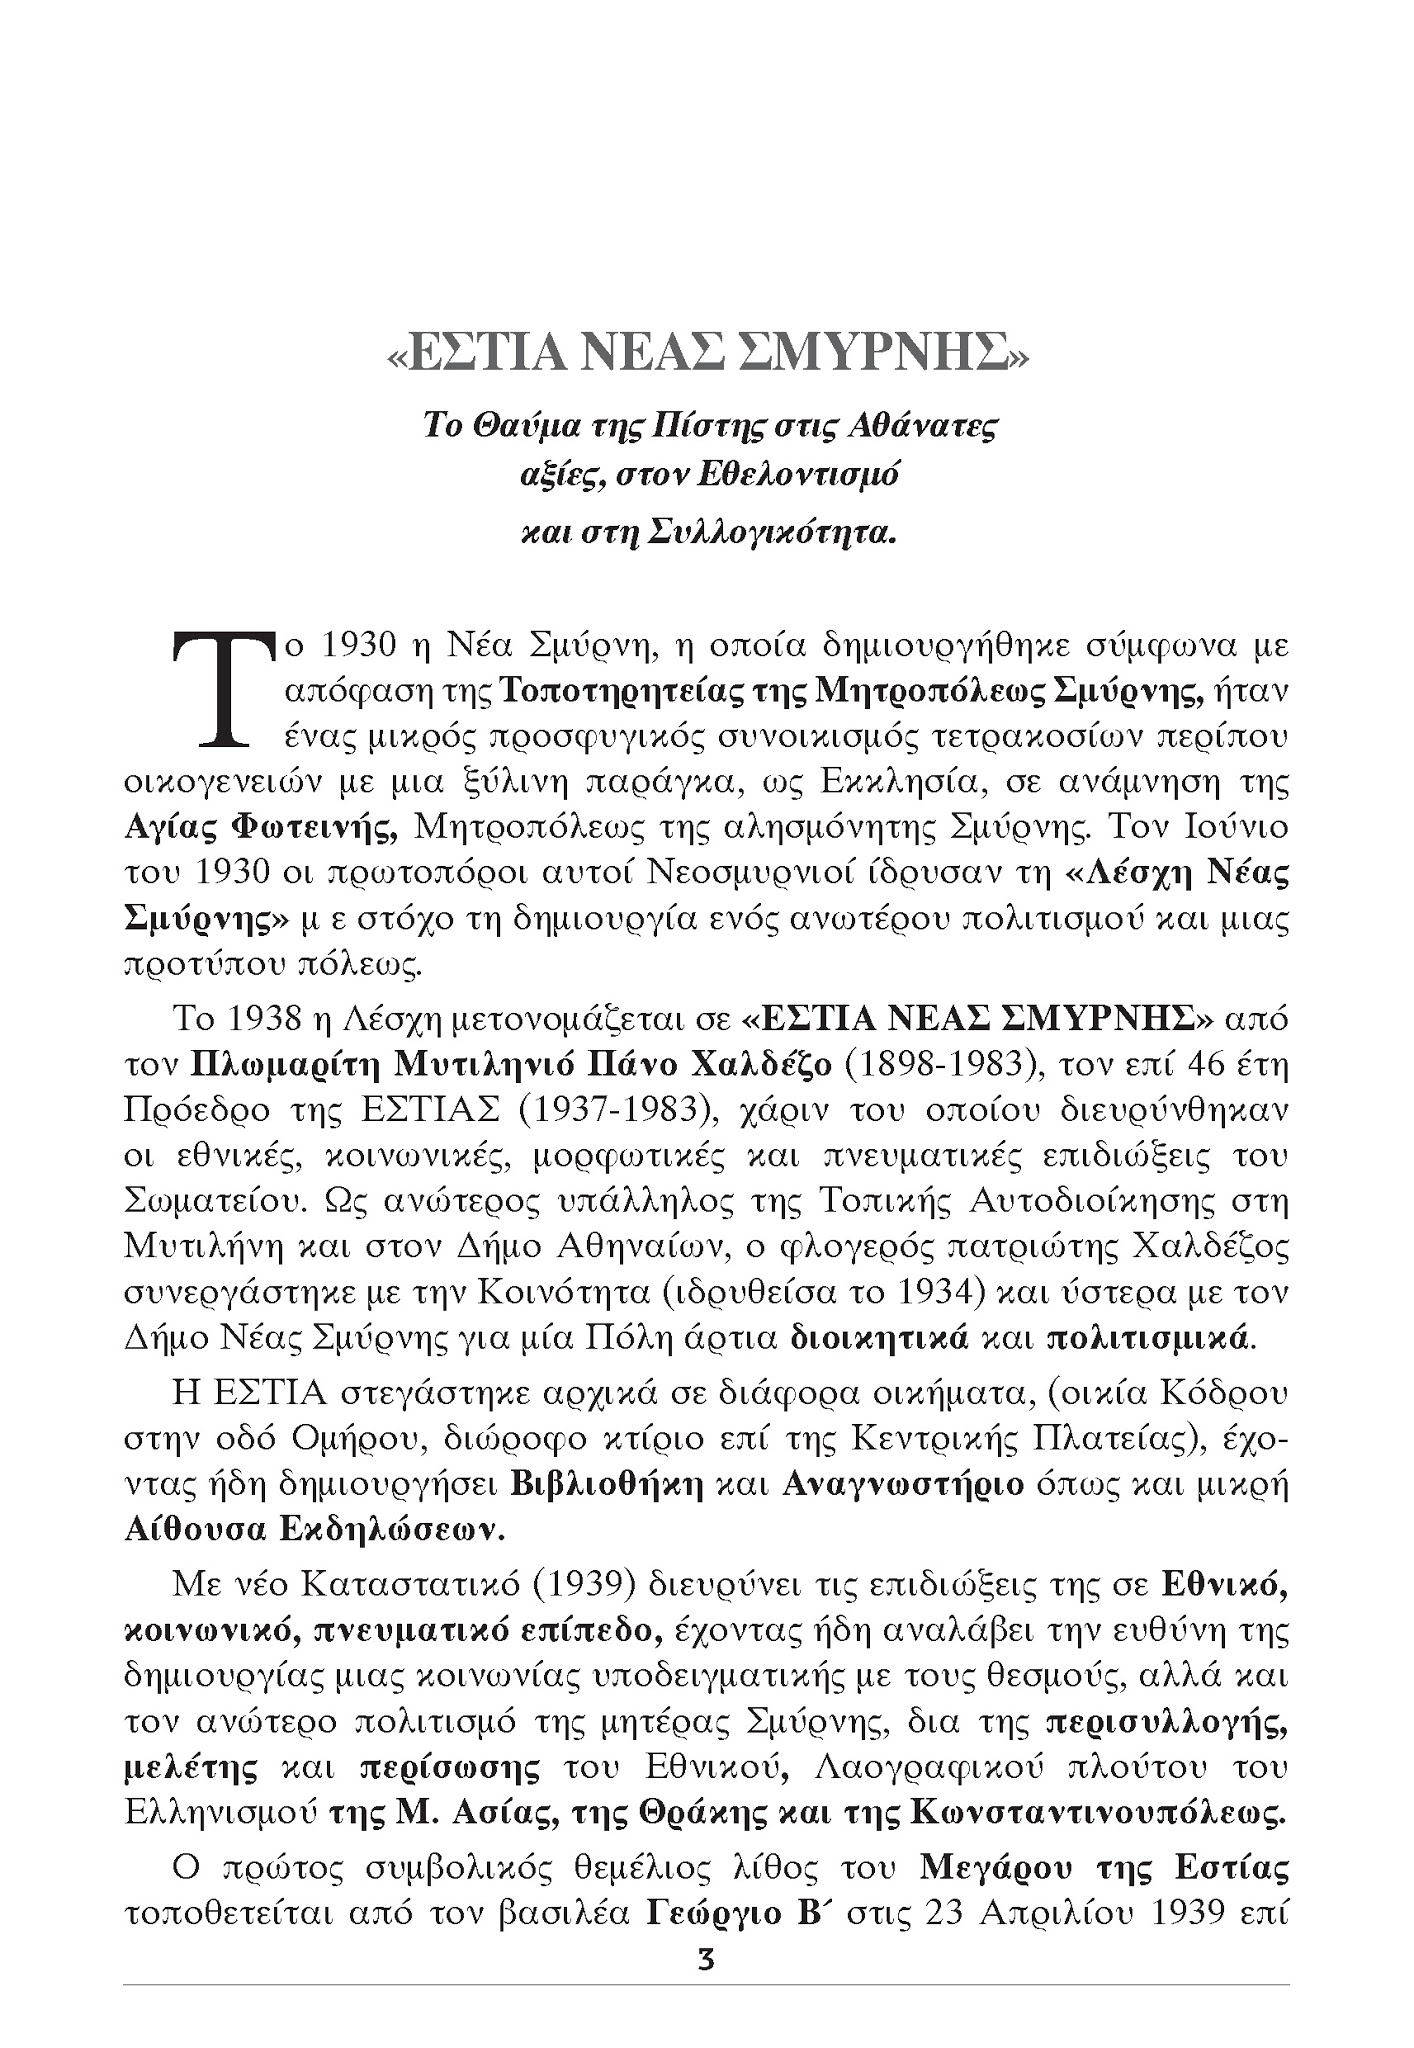 Photo: ΕΣΤΙΑ ΝΕΑΣ ΣΜΥΡΝΗΣ: «Το θαύμα της Πίστης στις Αθάνατες αξίες, στον Εθελοντισμό και στη Συλλογικότητα», της Βιργινίας Χαμουδοπούλου-Κωνσταντινίδου, Γενικής Γραμματέως της Εστίας, Δεκέμβριος 2015, σελ. 3.